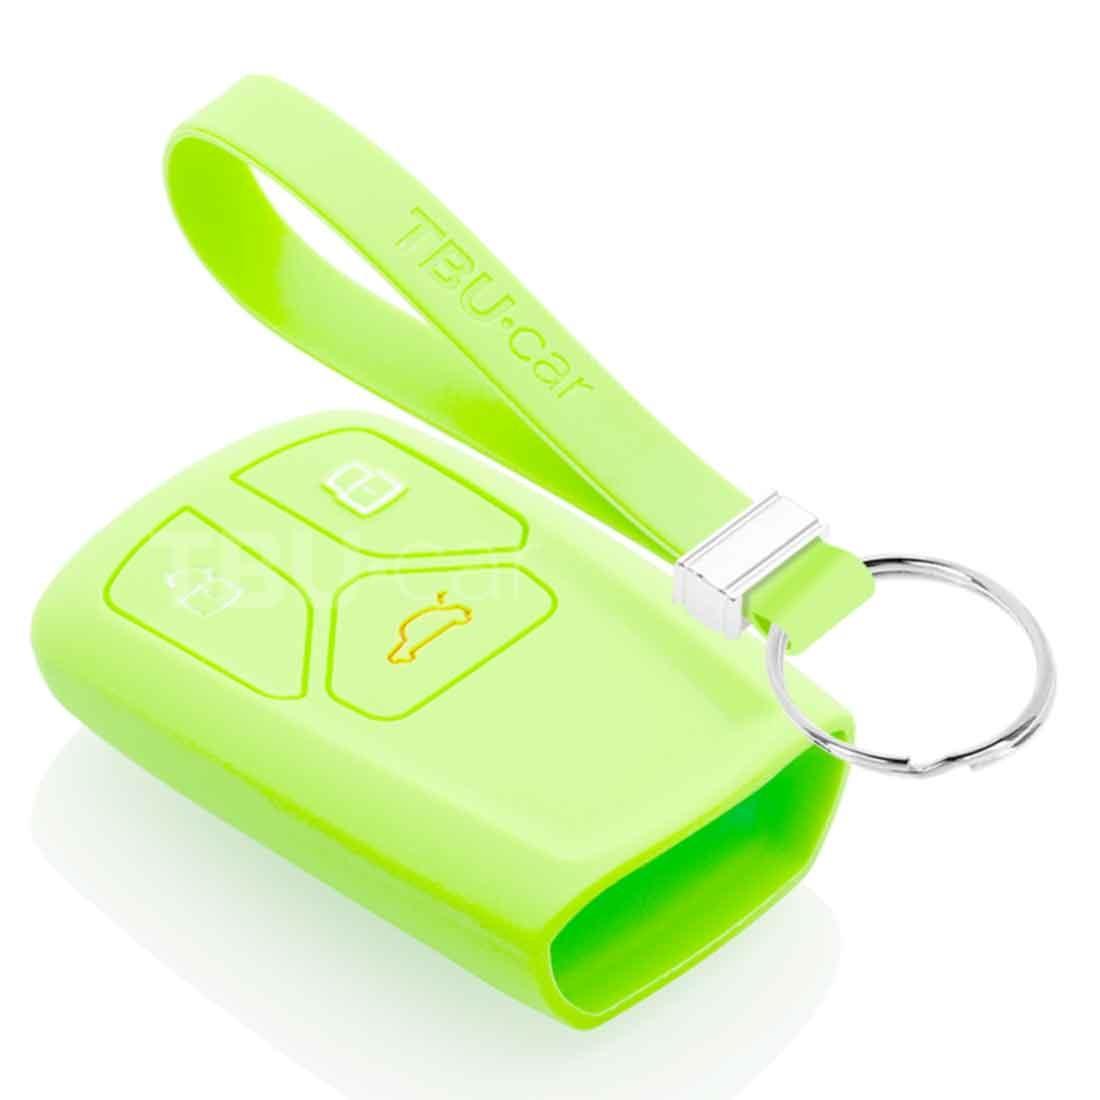 TBU car TBU car Autoschlüssel Hülle kompatibel mit Audi 3 Tasten (Keyless Entry) - Schutzhülle aus Silikon - Auto Schlüsselhülle Cover in Im Dunkeln leuchten